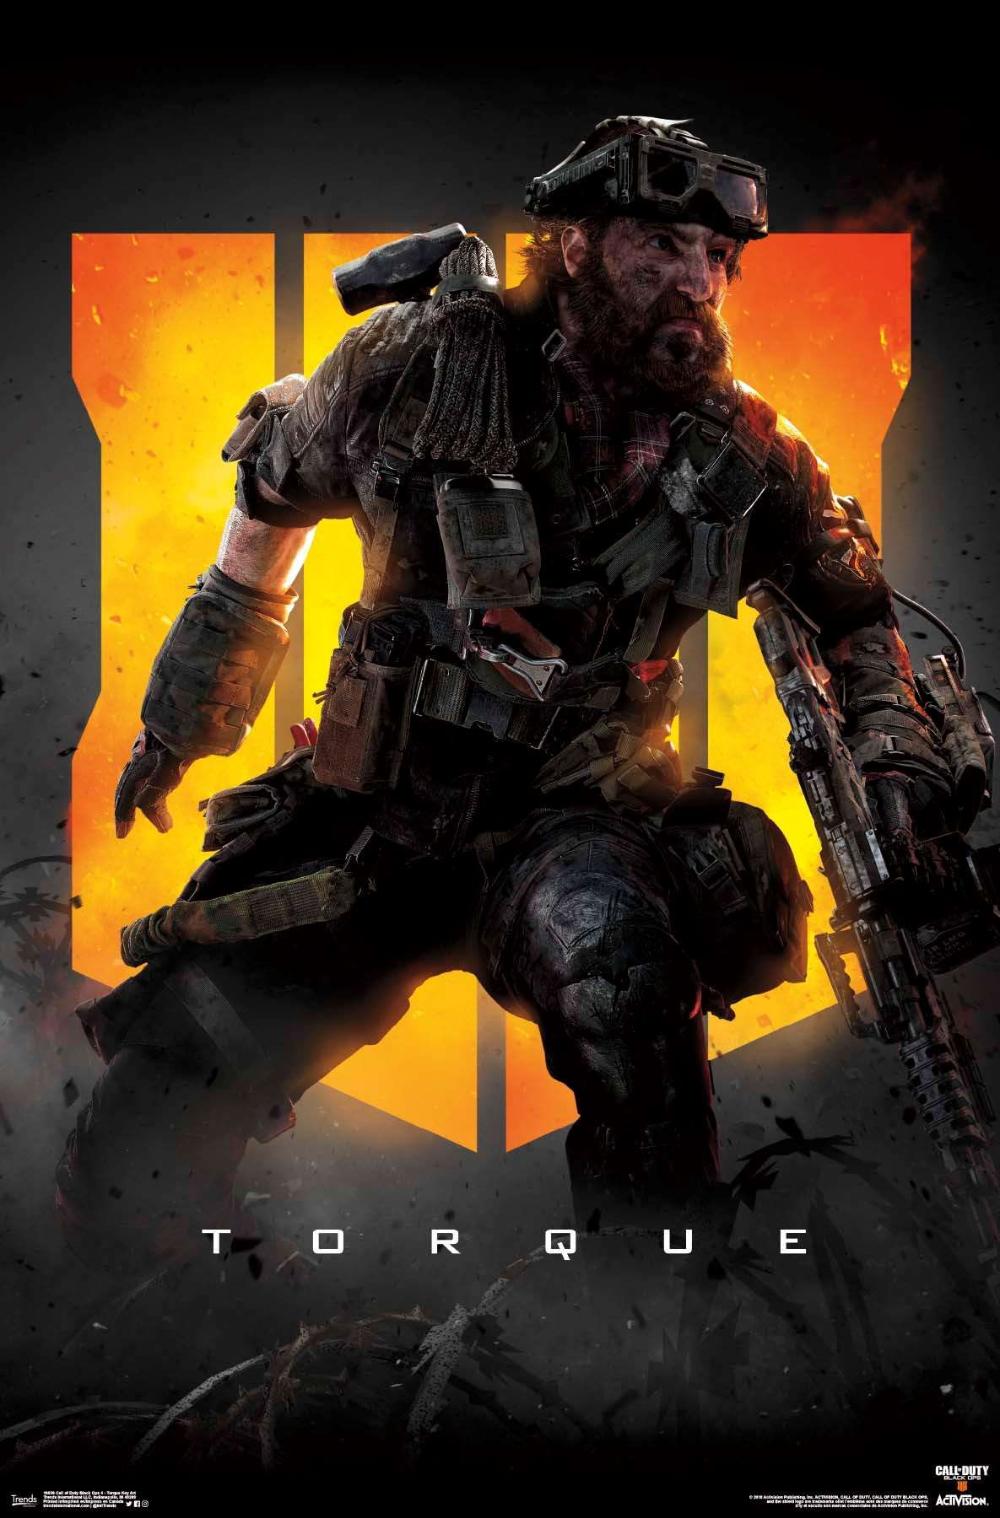 Call Of Duty Black Ops 4 Torque Key Art Call Of Duty Black Ops 3 Call Of Duty Black Black Ops 4